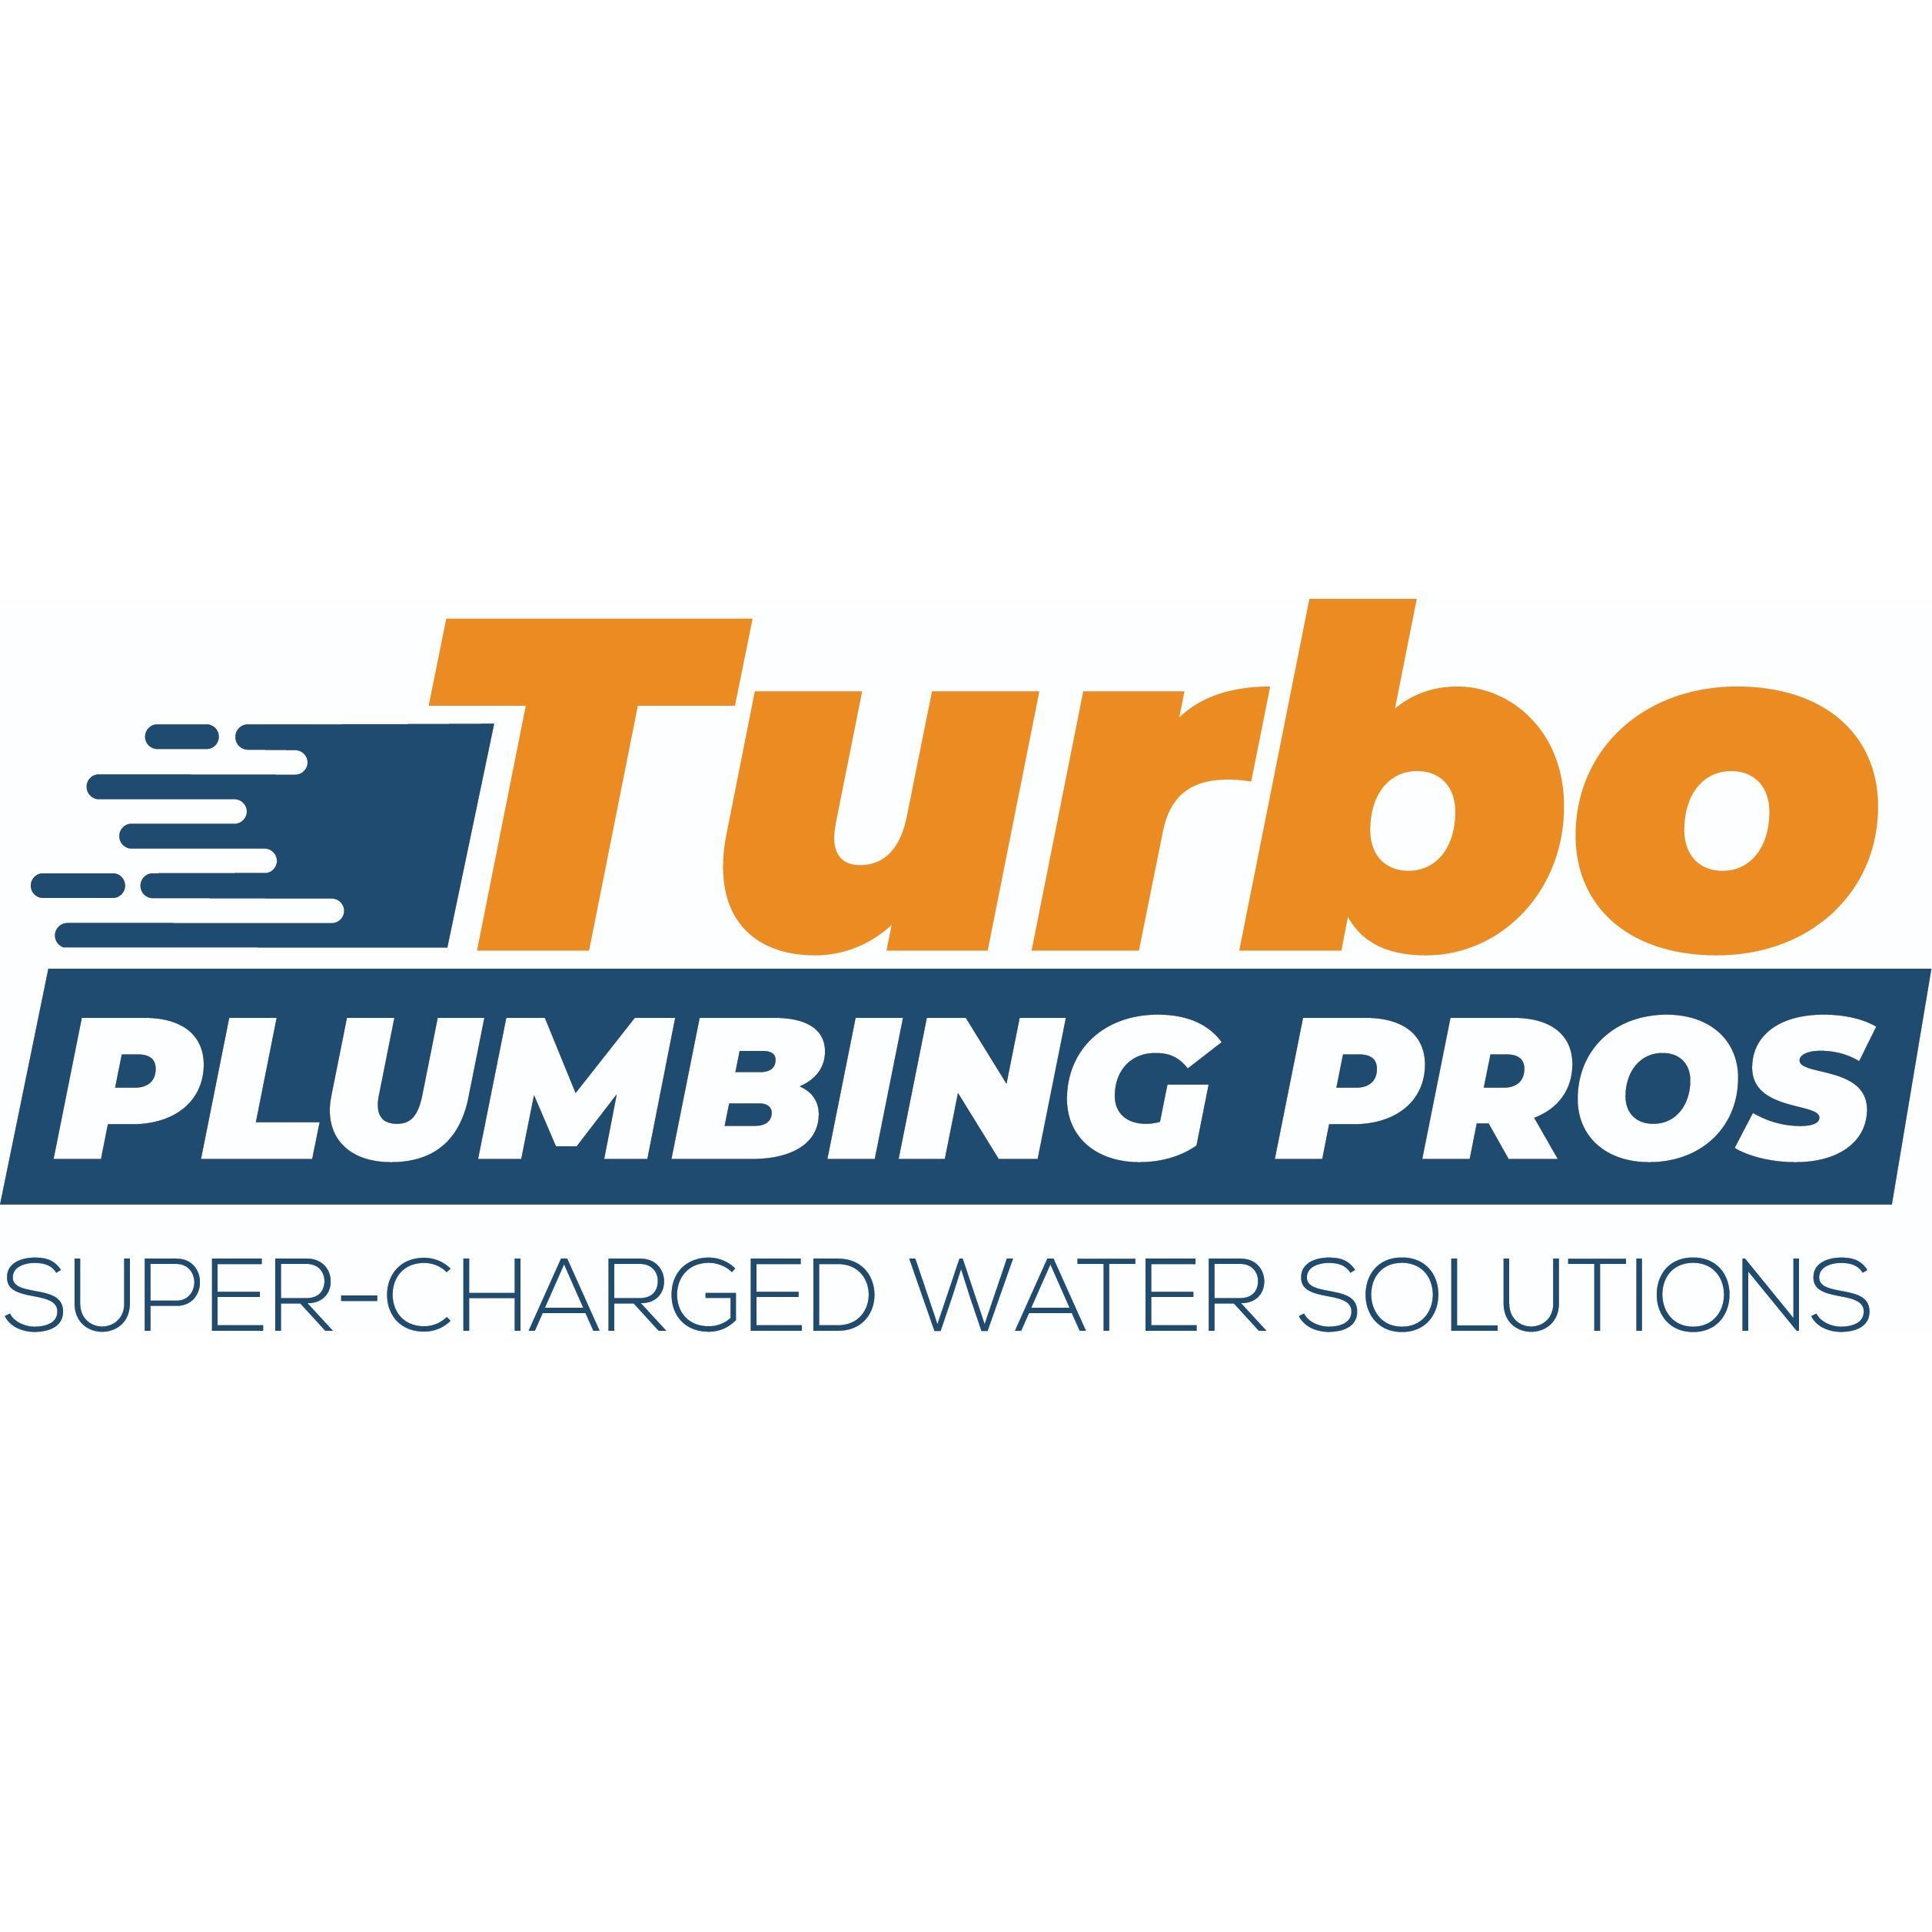 Turbo Plumbing Pros - Lexington, KY 40508 - (859)278-0063 | ShowMeLocal.com